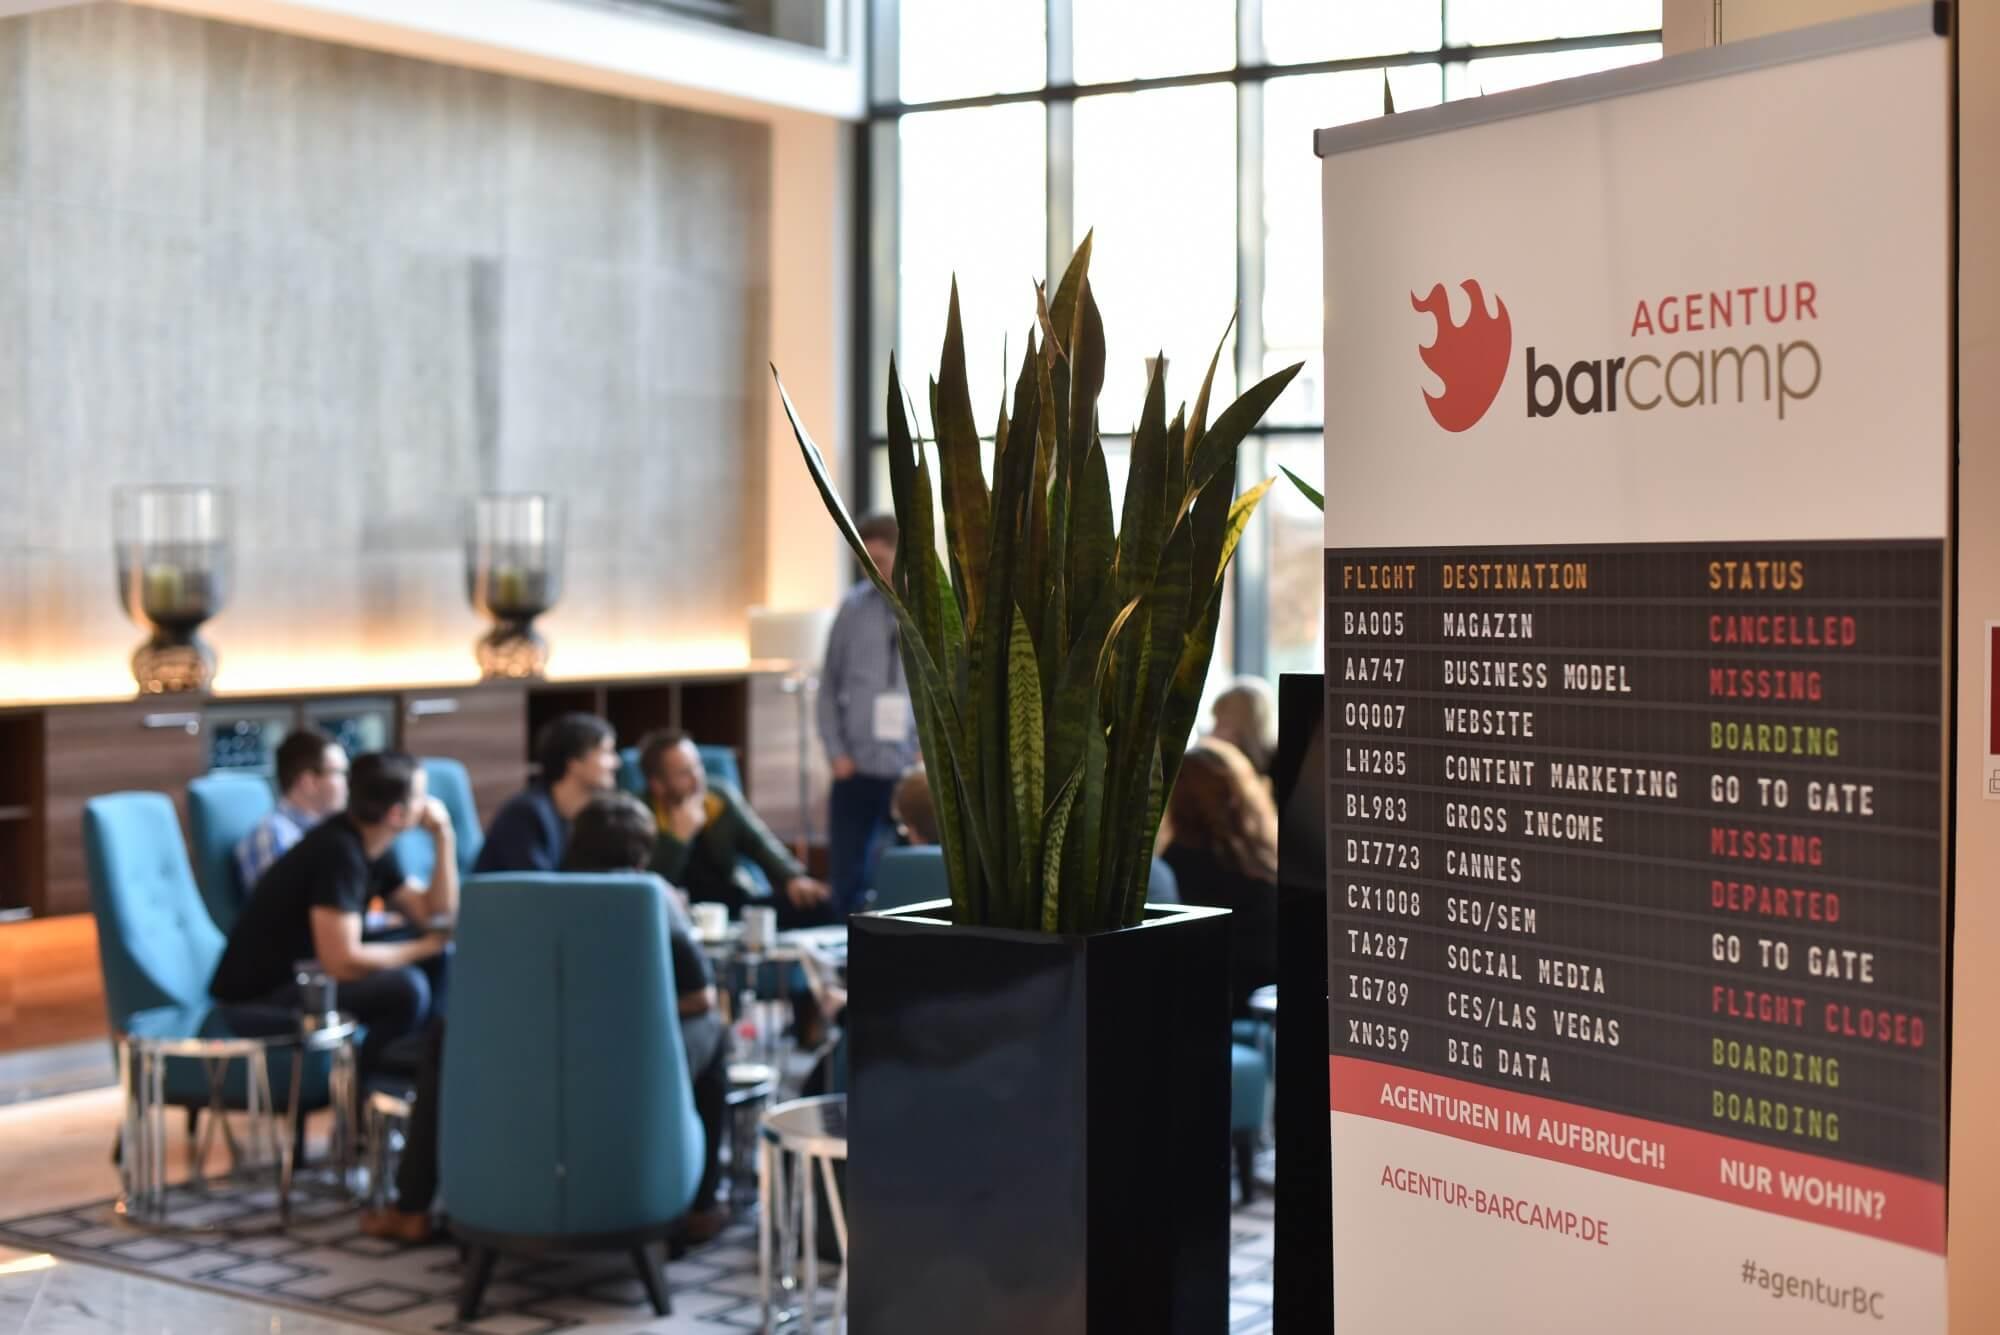 Agentur-Barcamp 2016